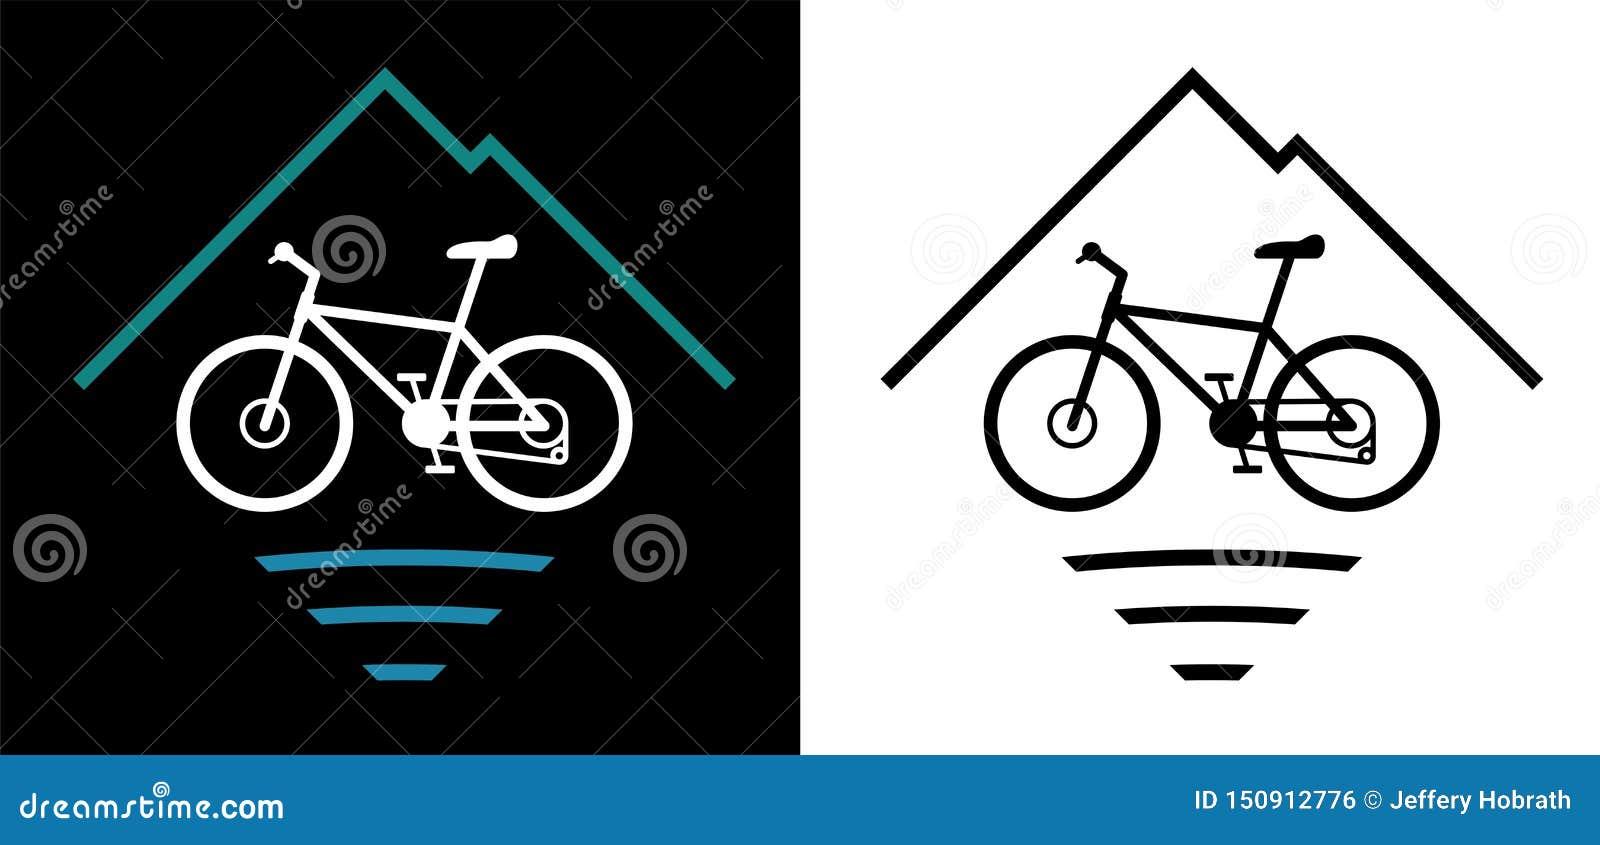 Outdoor Mountain Bike Logo Vector Illustration